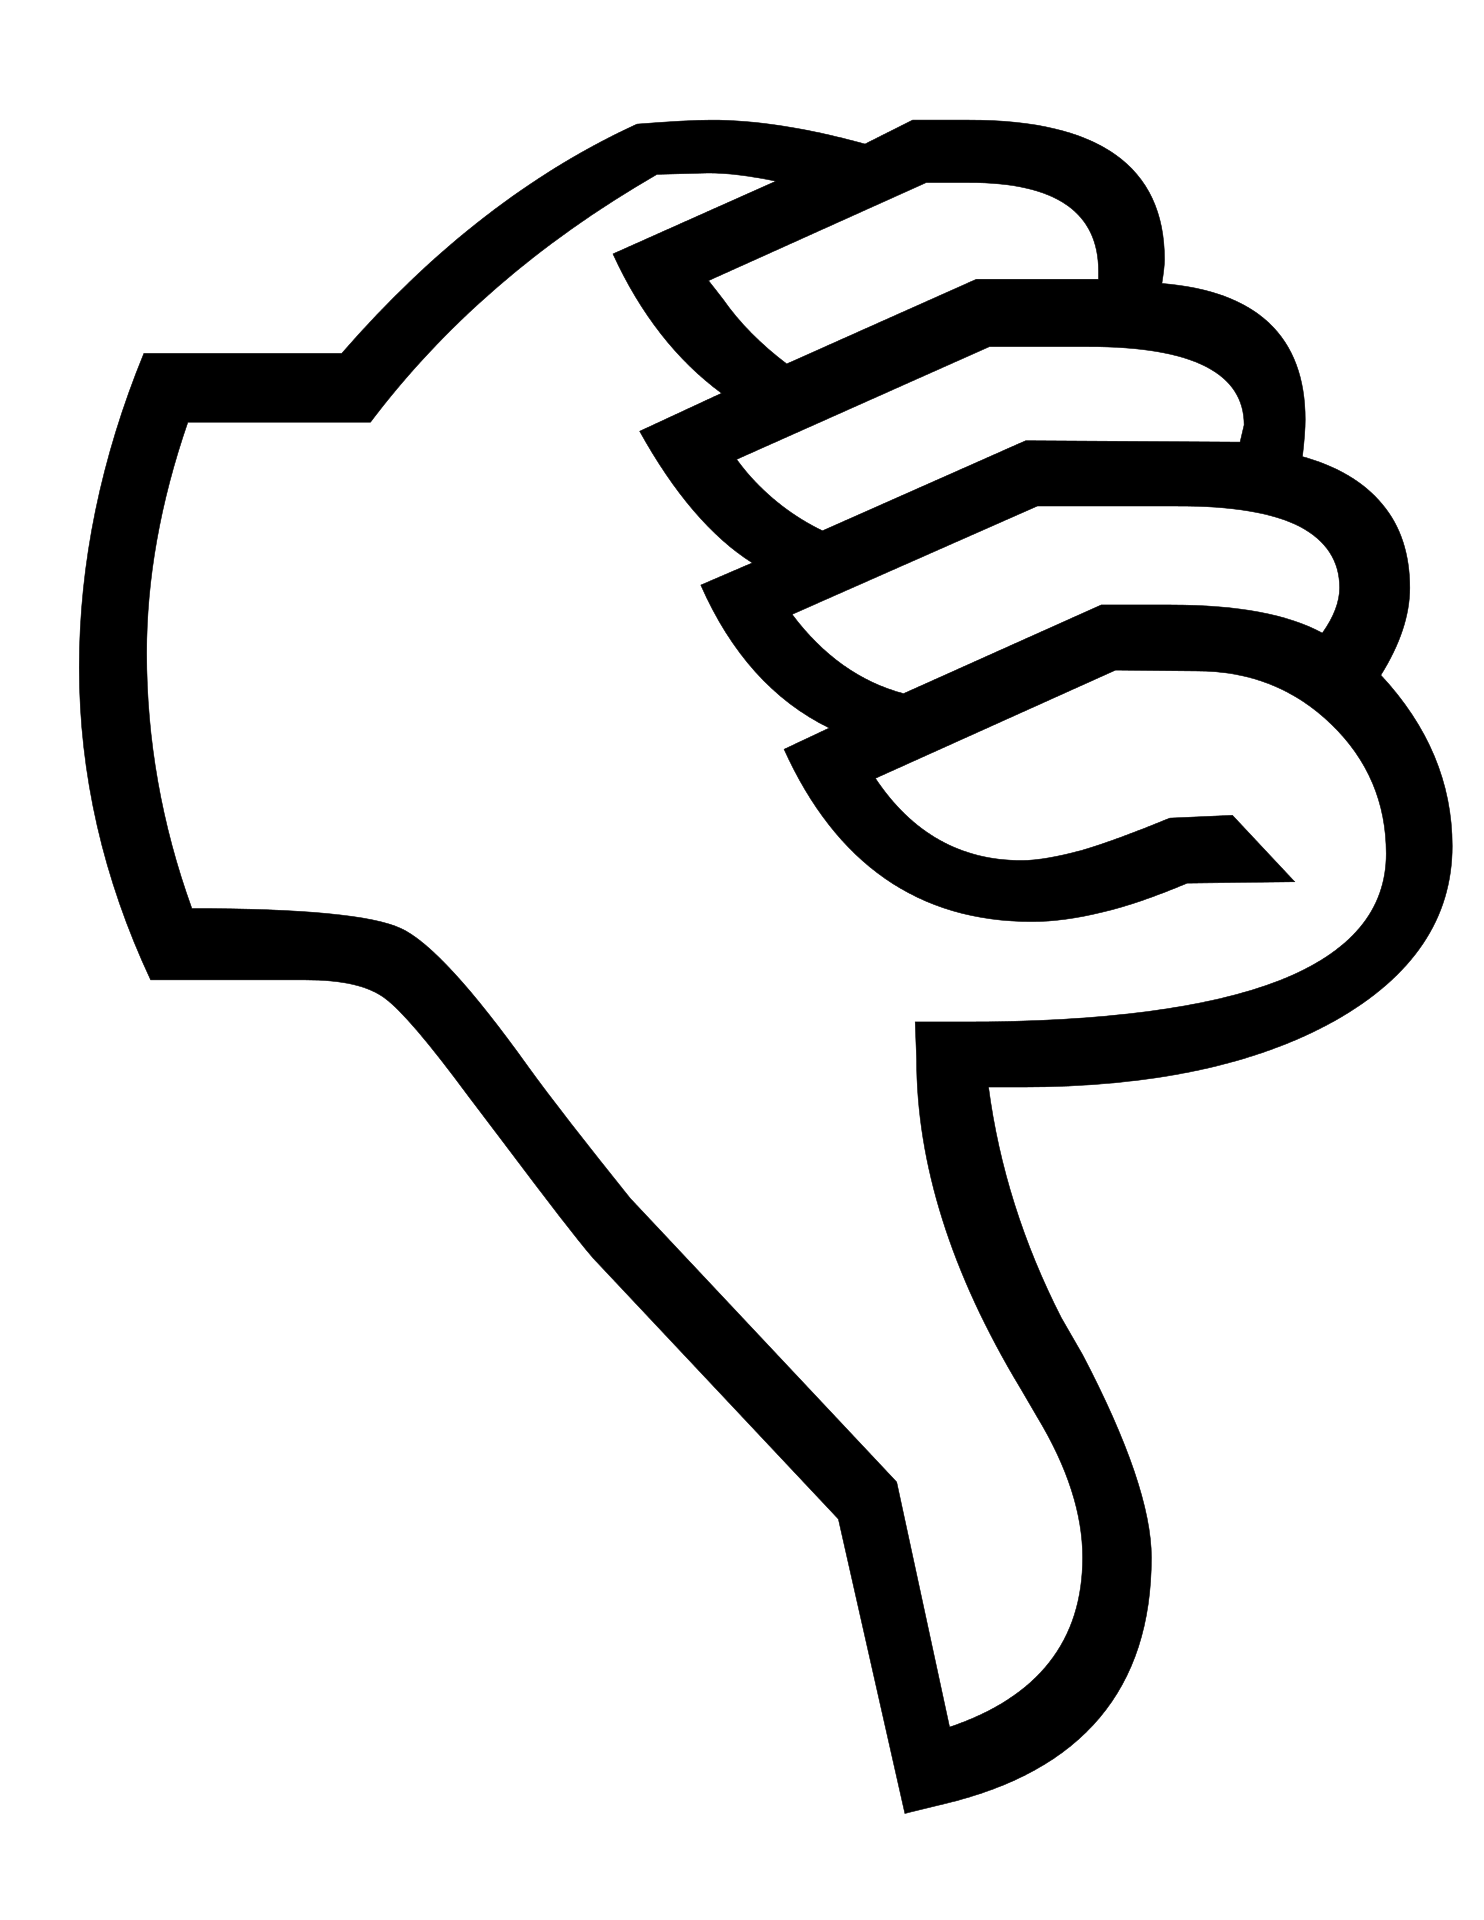 F70565FB-73B2-4669-BD7B-ED7A9E0CFBEB